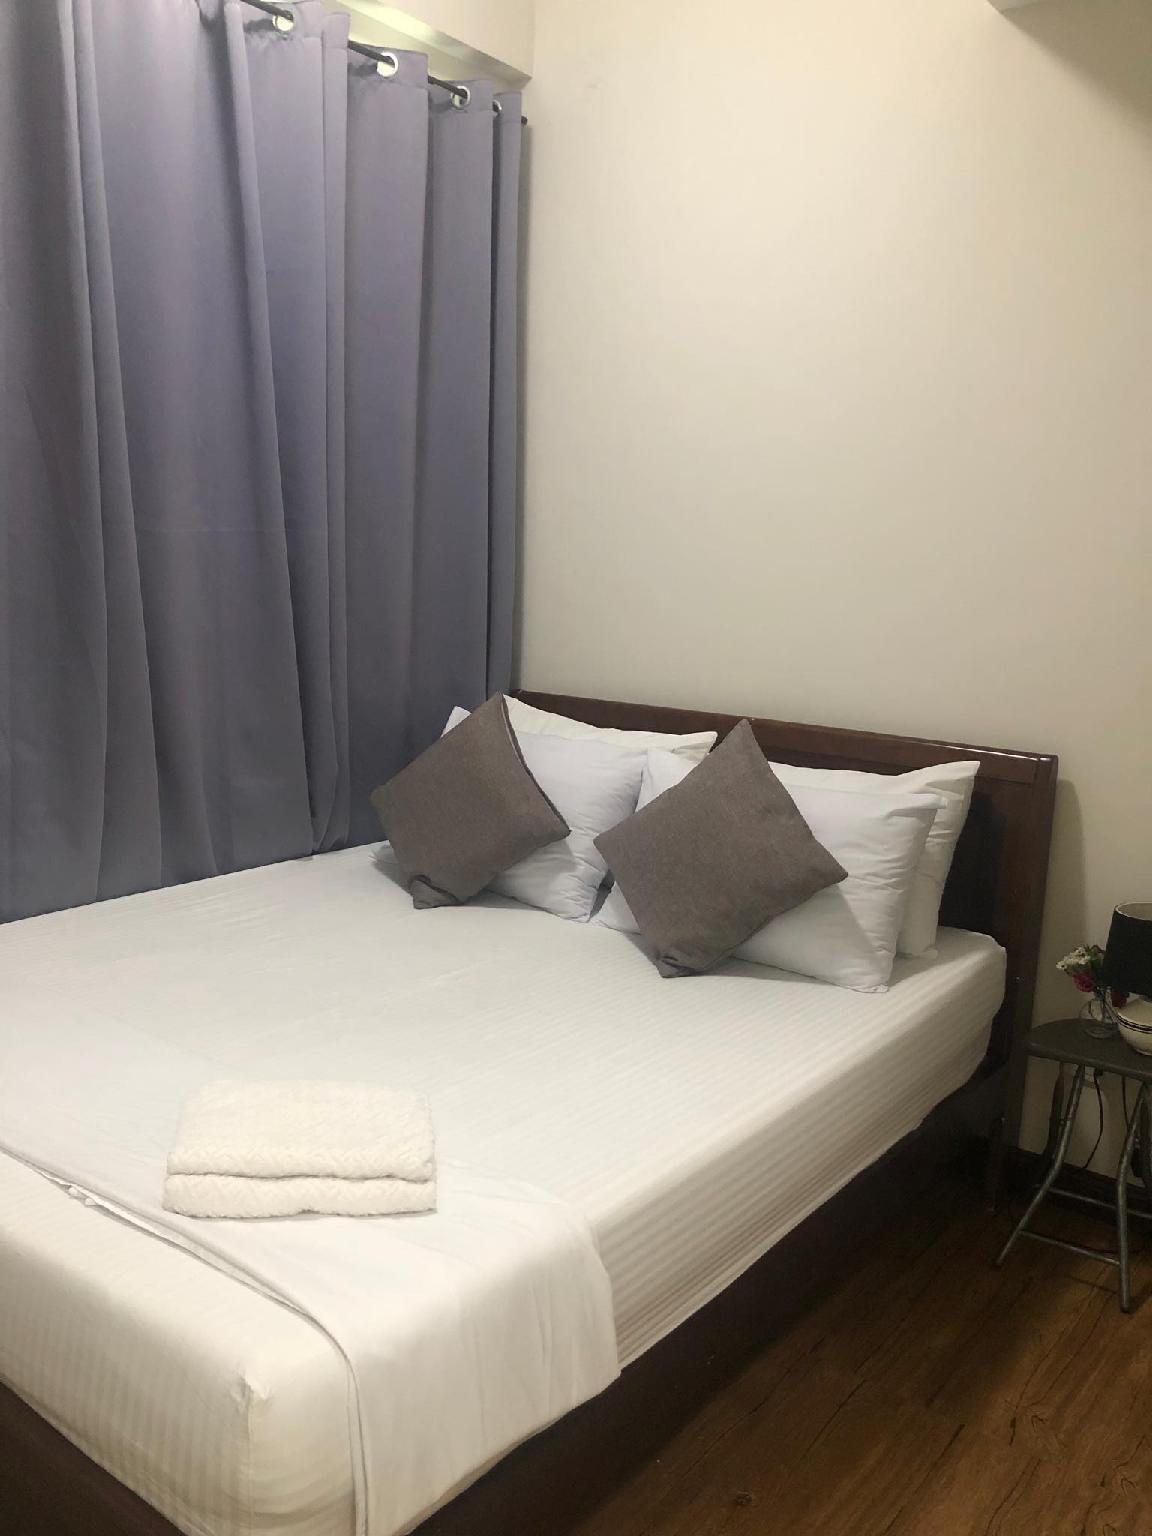 BDS Bay Area Suites 1 Bed Room  R4